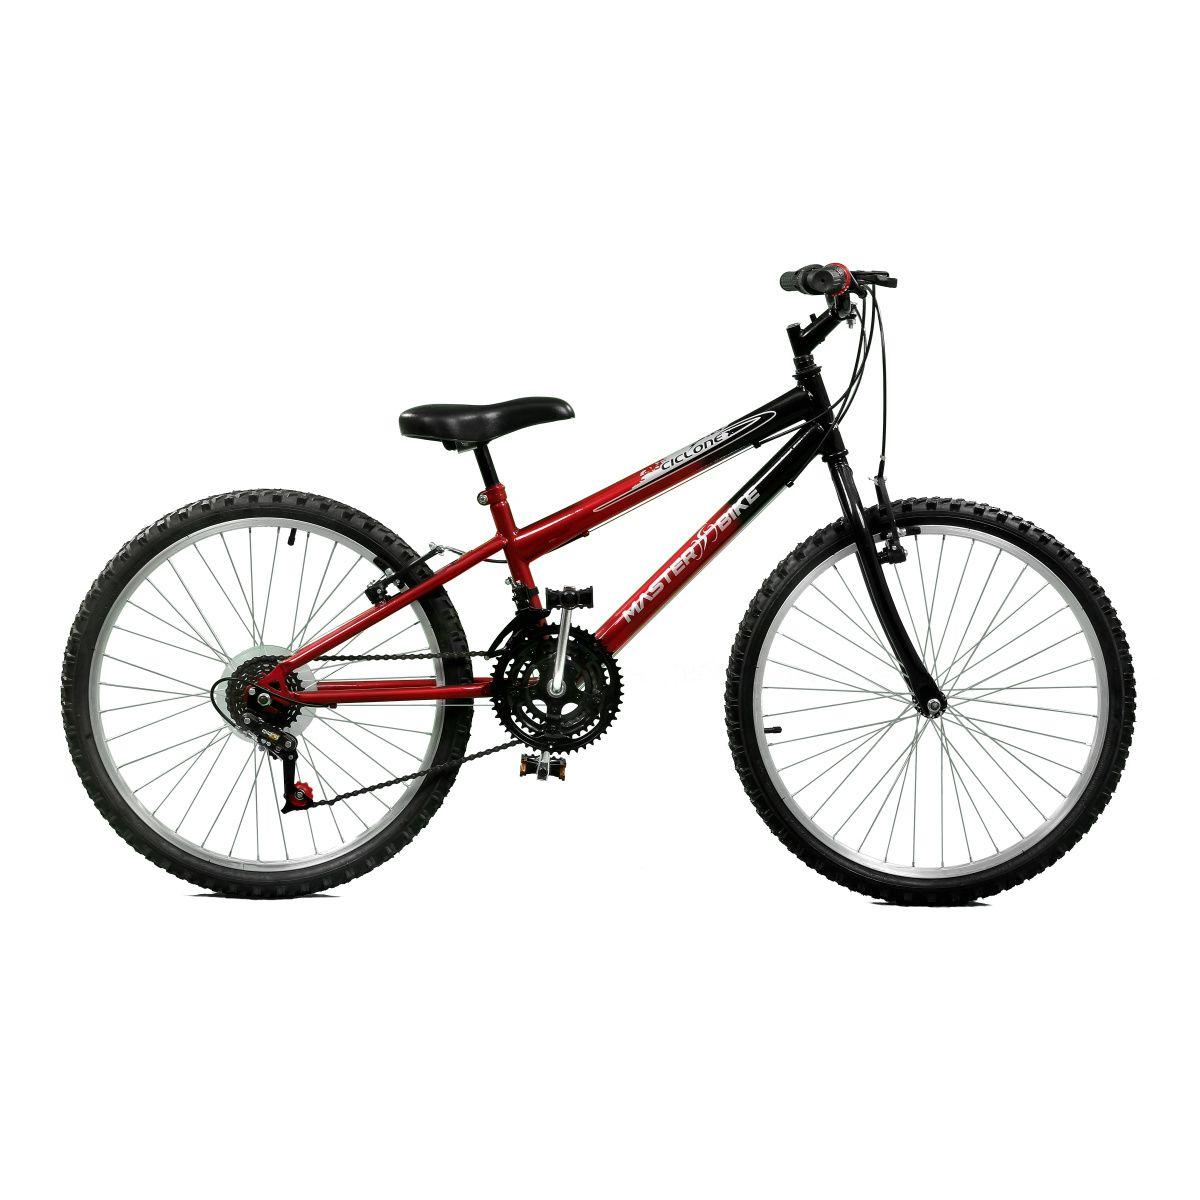 Bicicleta Master Bike Aro 24 Ciclone Plus 21 Marchas V-Brake Vermelho/Preto